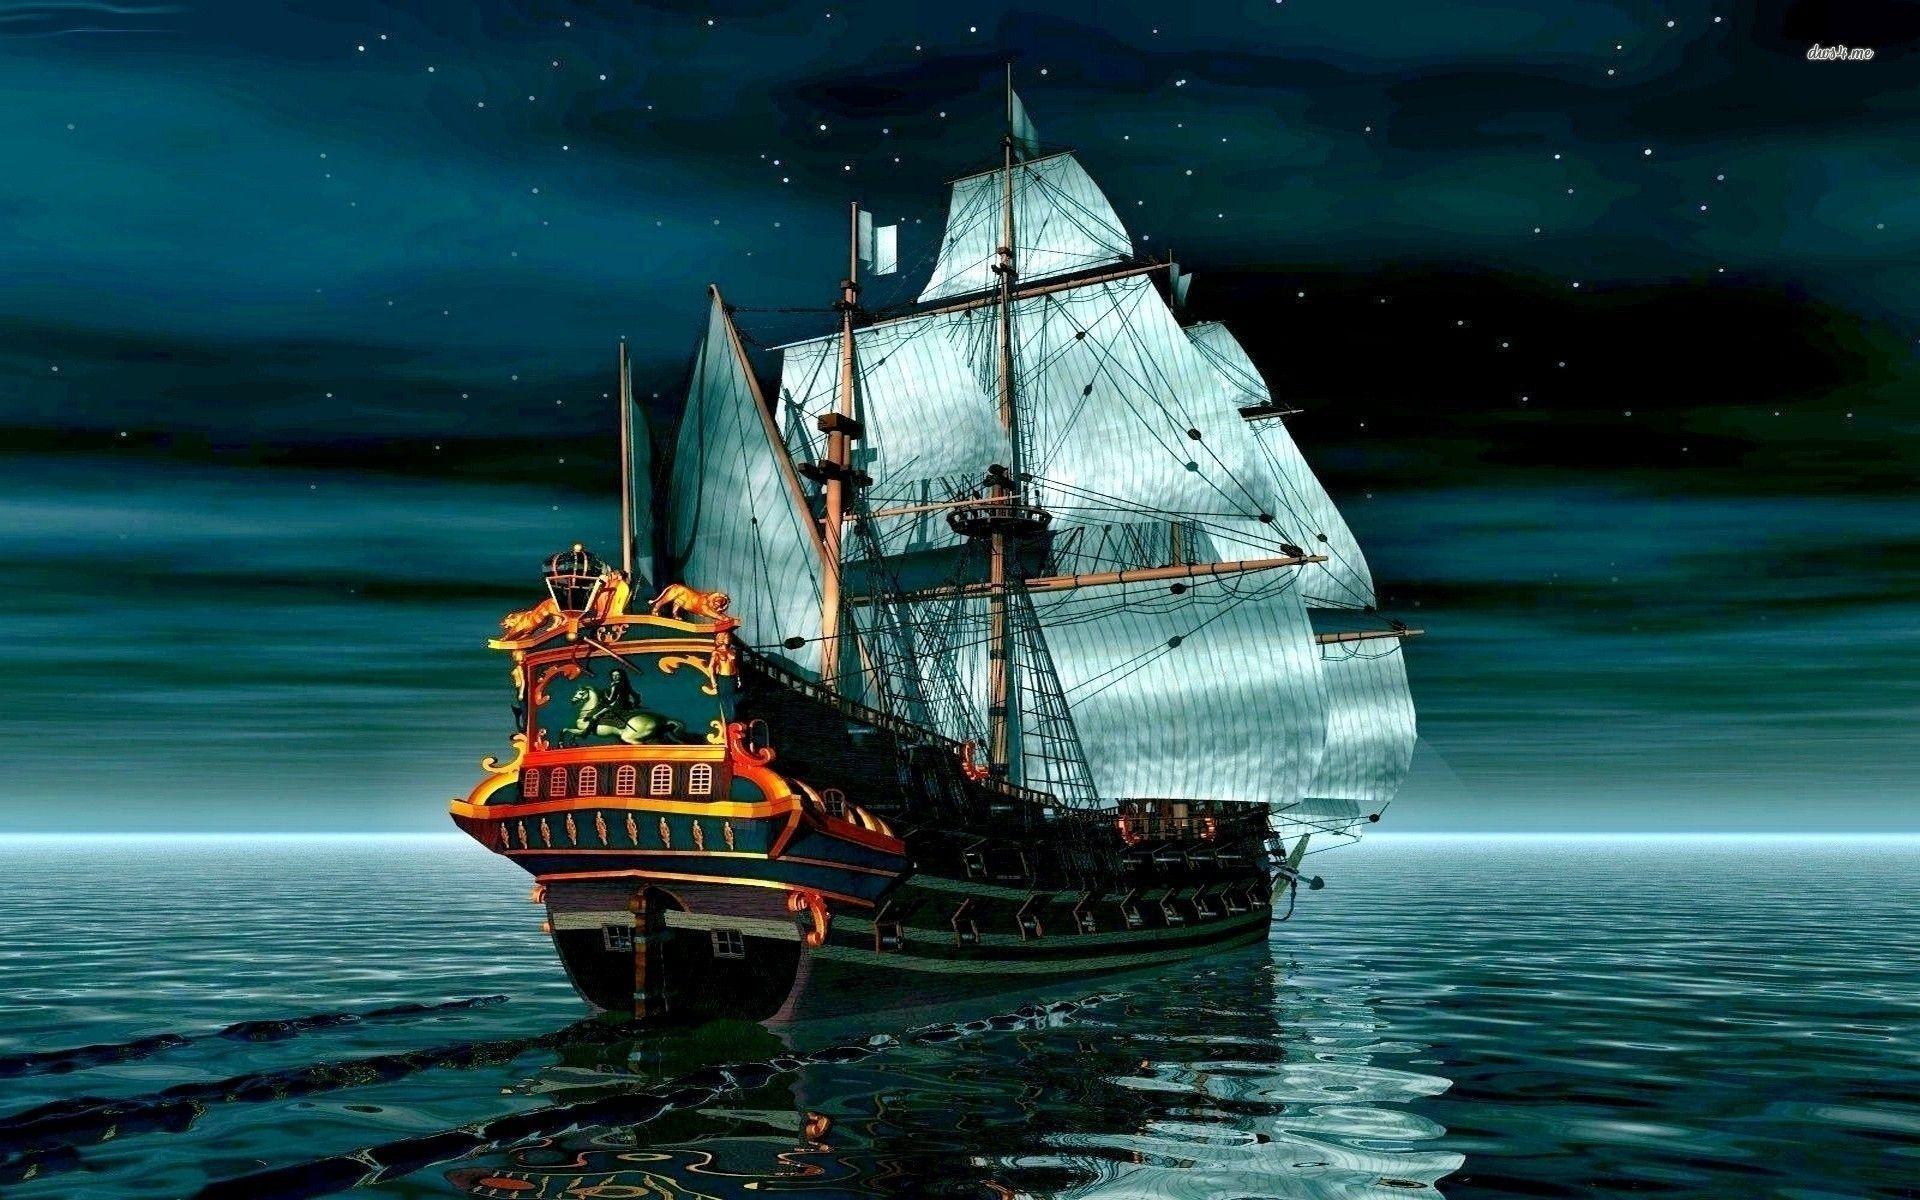 Pirate ship wallpaper – Fantasy wallpapers – #17934